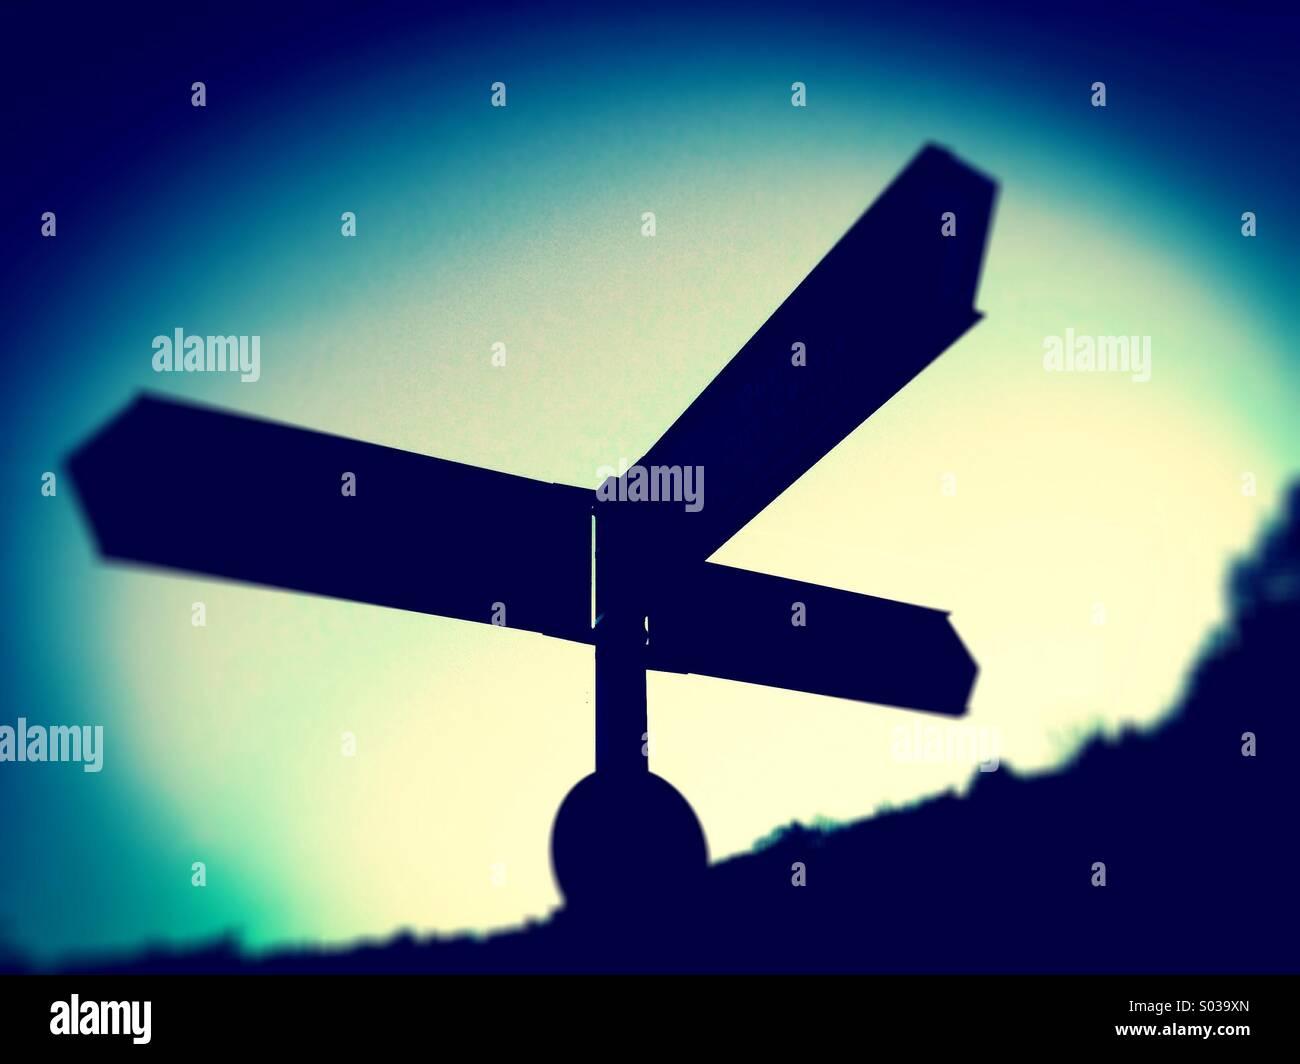 Signpost - Stock Image